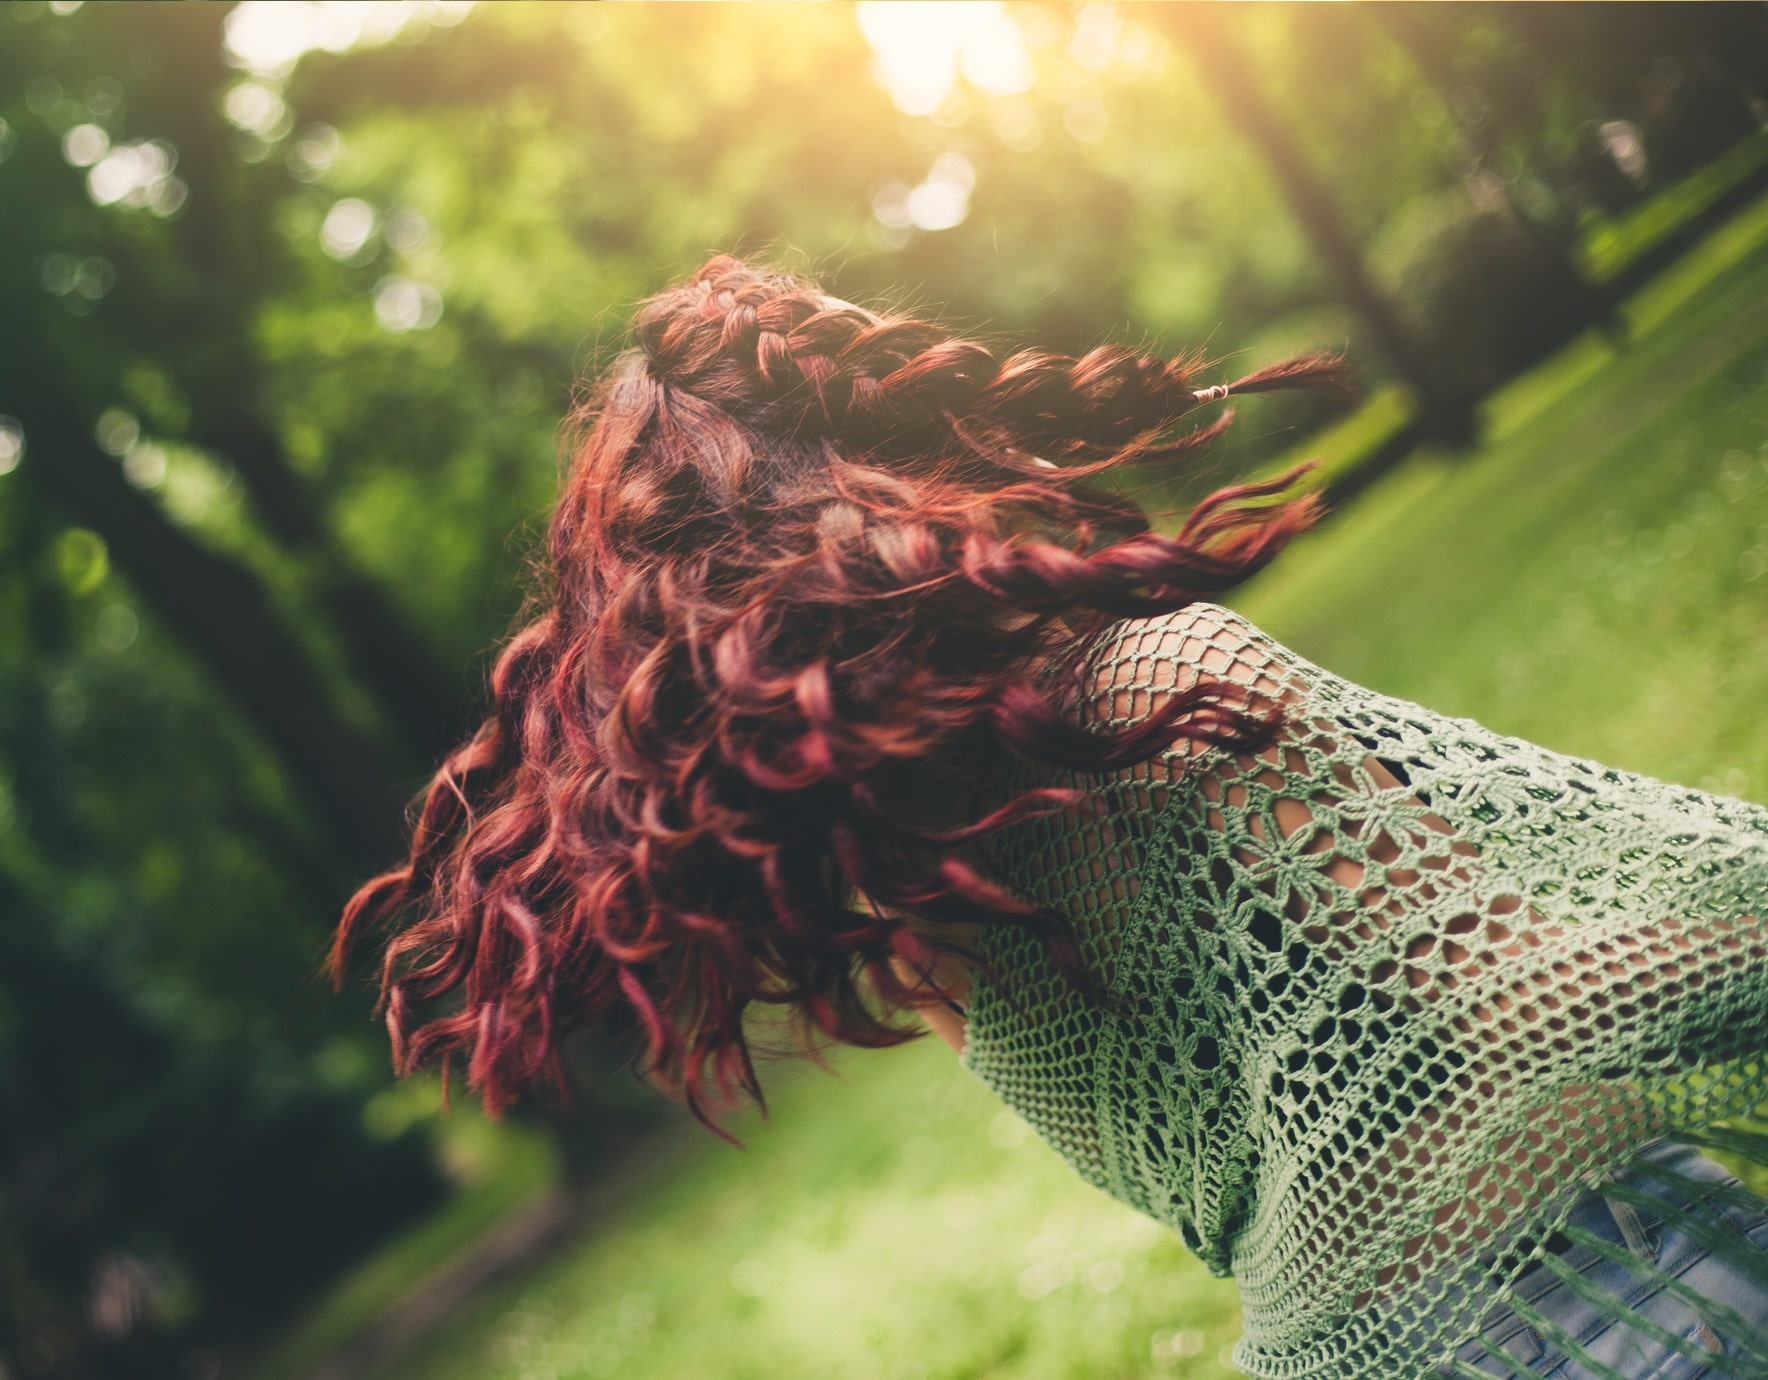 cabelos ruivos 6 - Tudo o que você sempre quis saber sobre cabelos ruivos